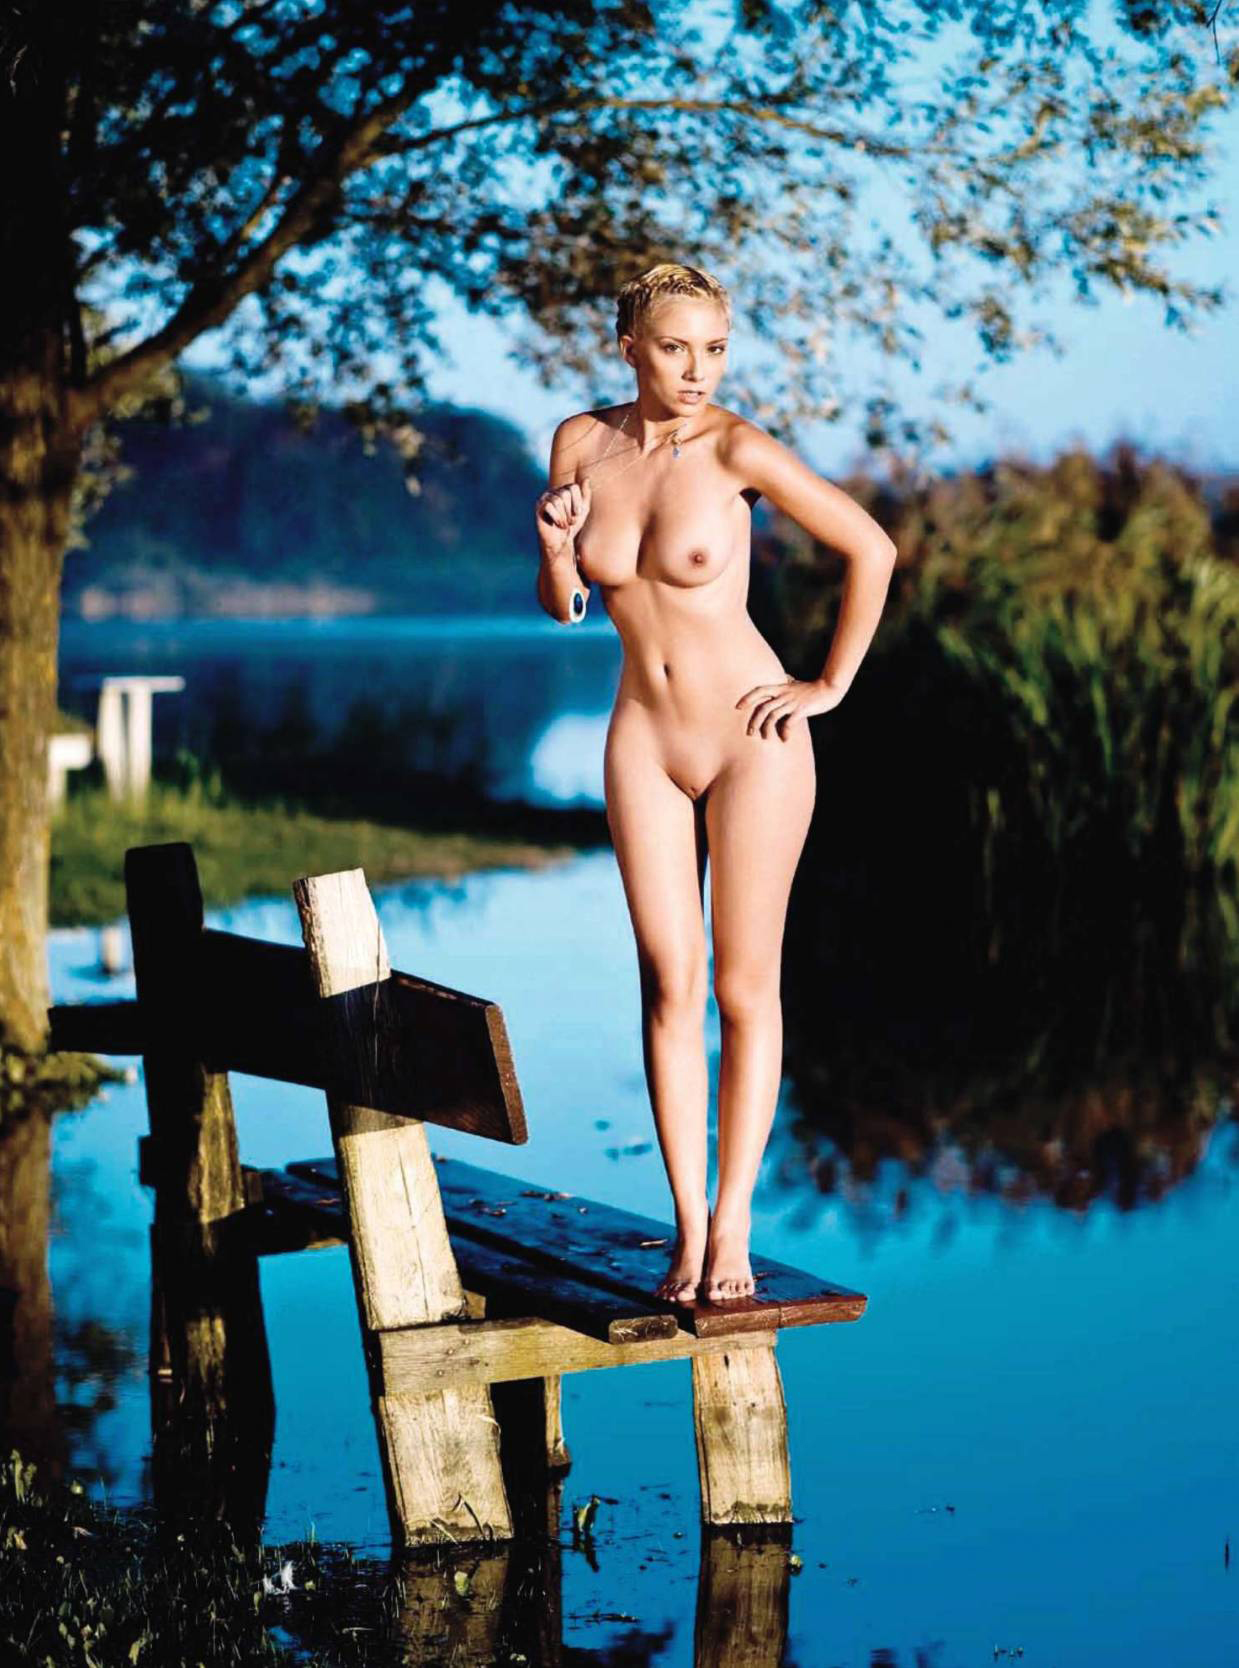 65906_Anamarija_Frlan_Playboy_2010_10_Croatia_12_123_509lo.jpg